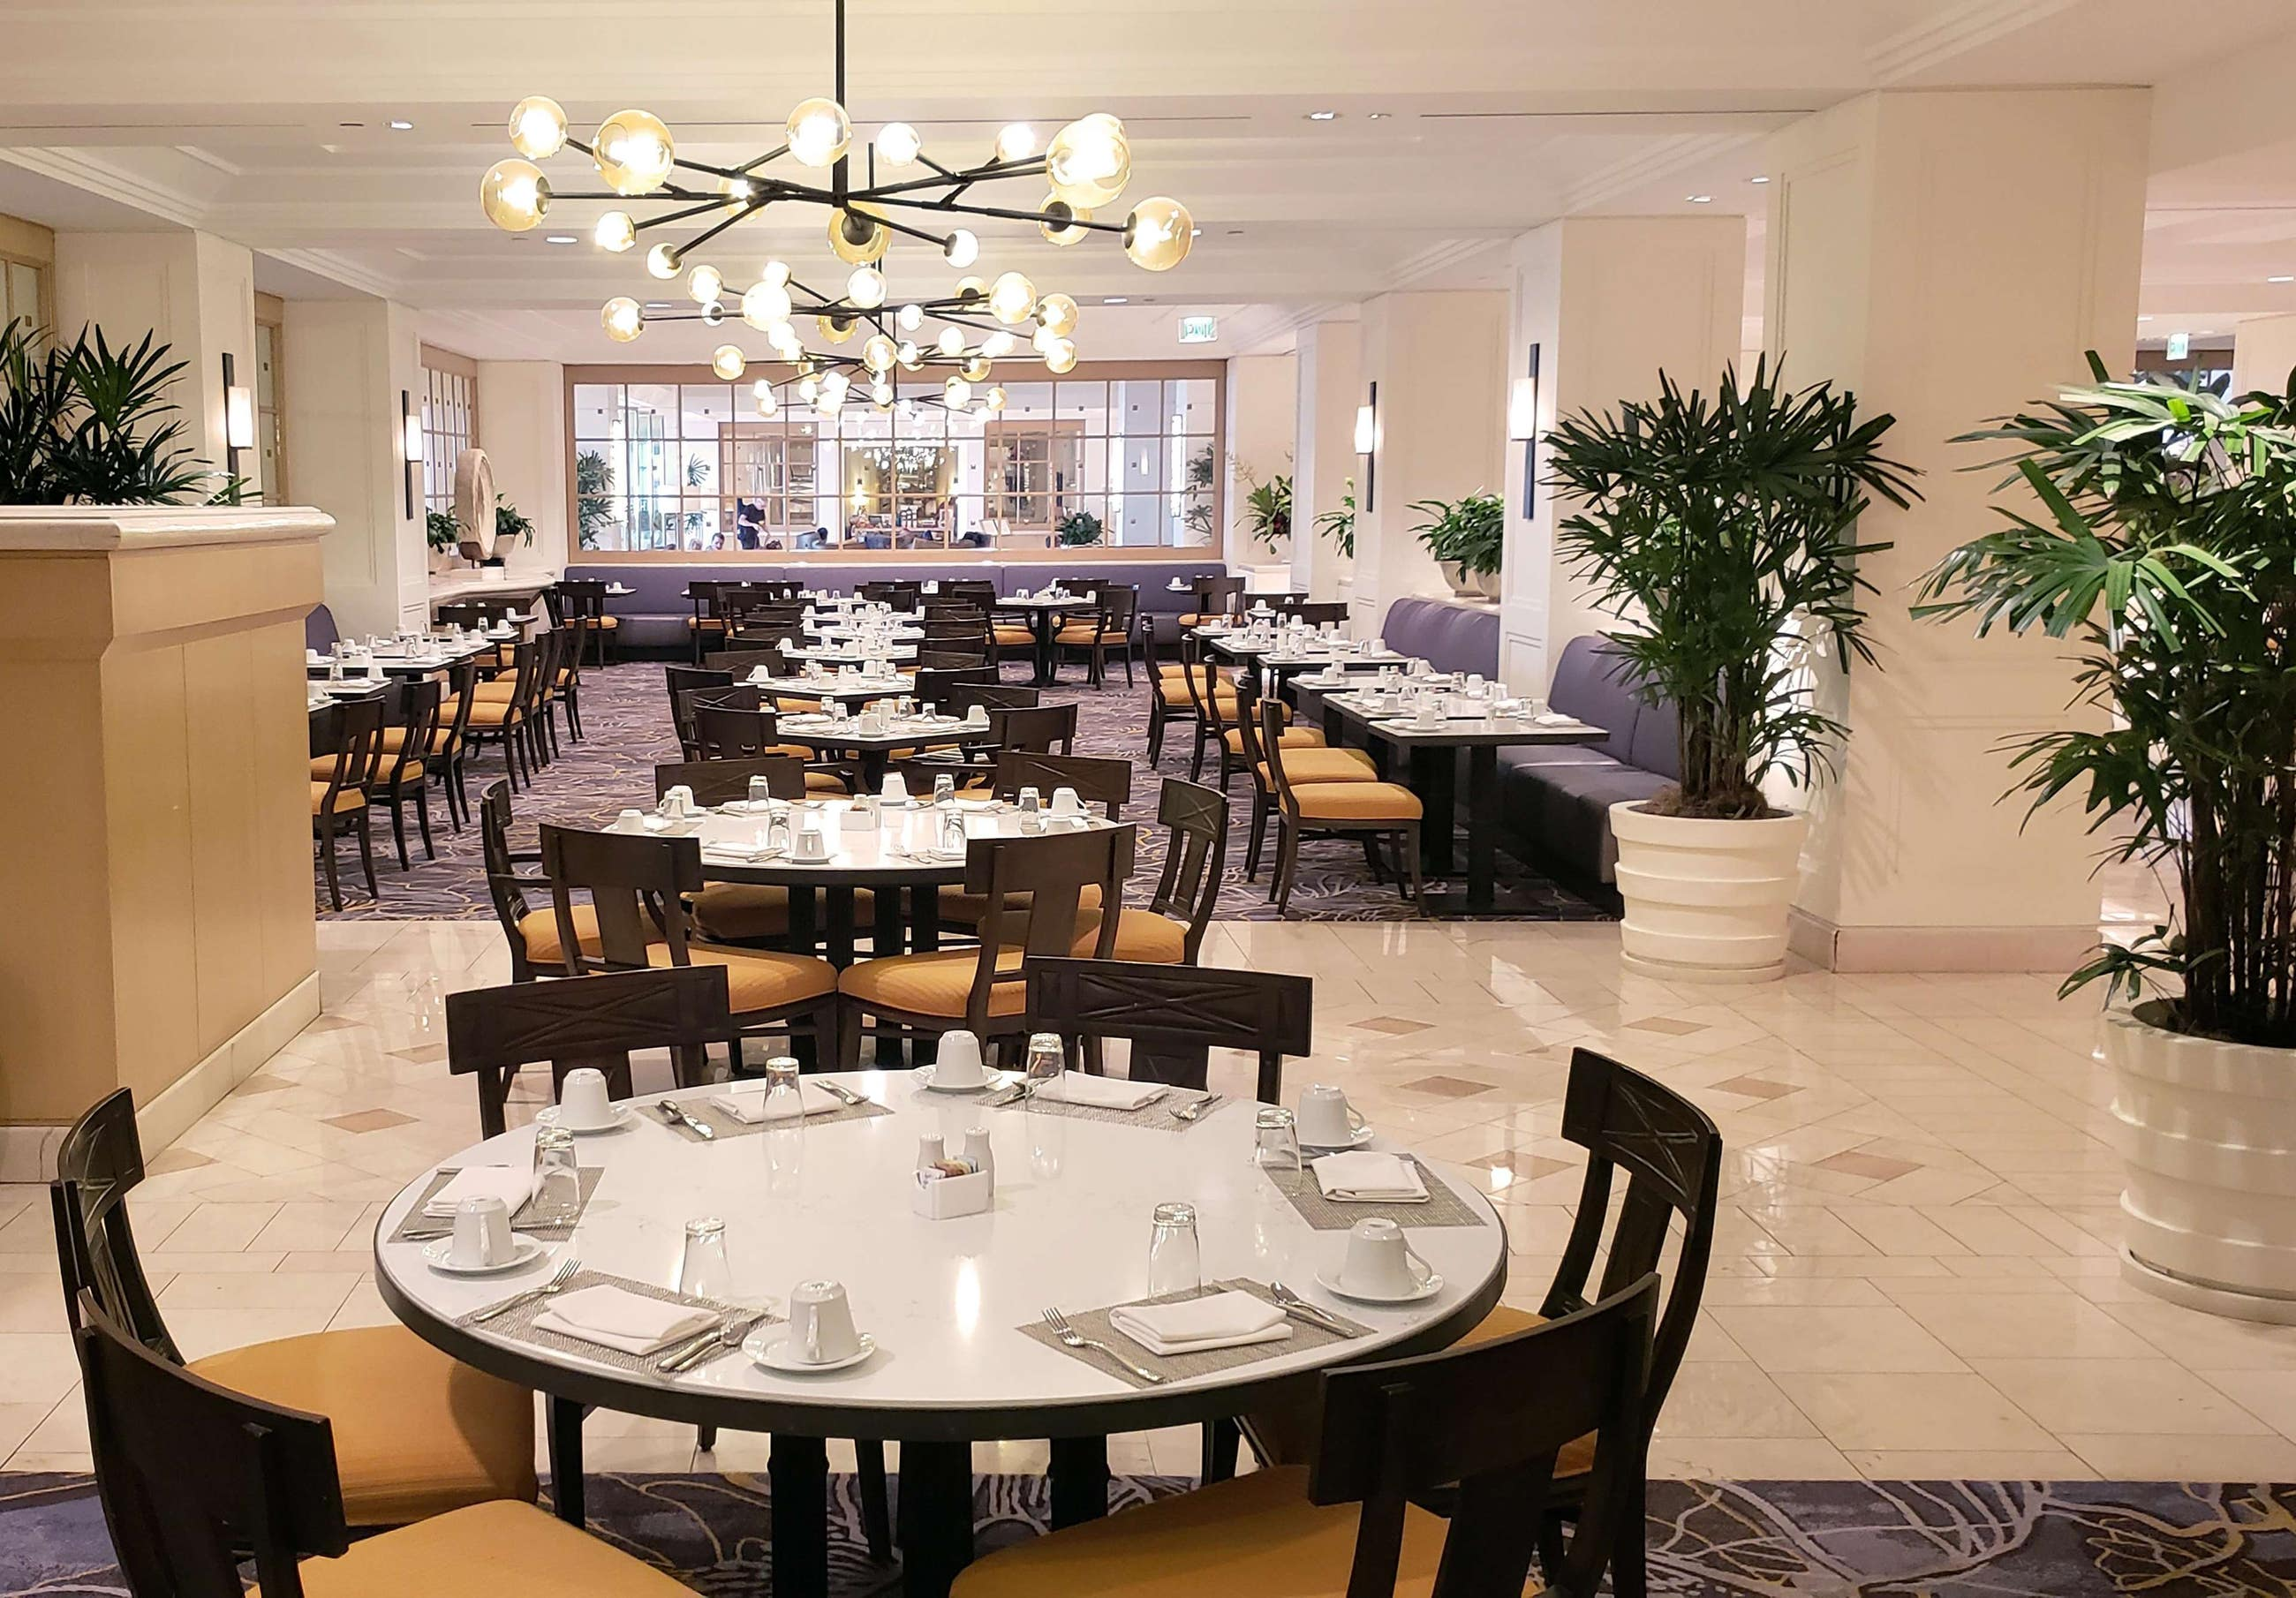 The Café at Hilton Los Angeles Airport